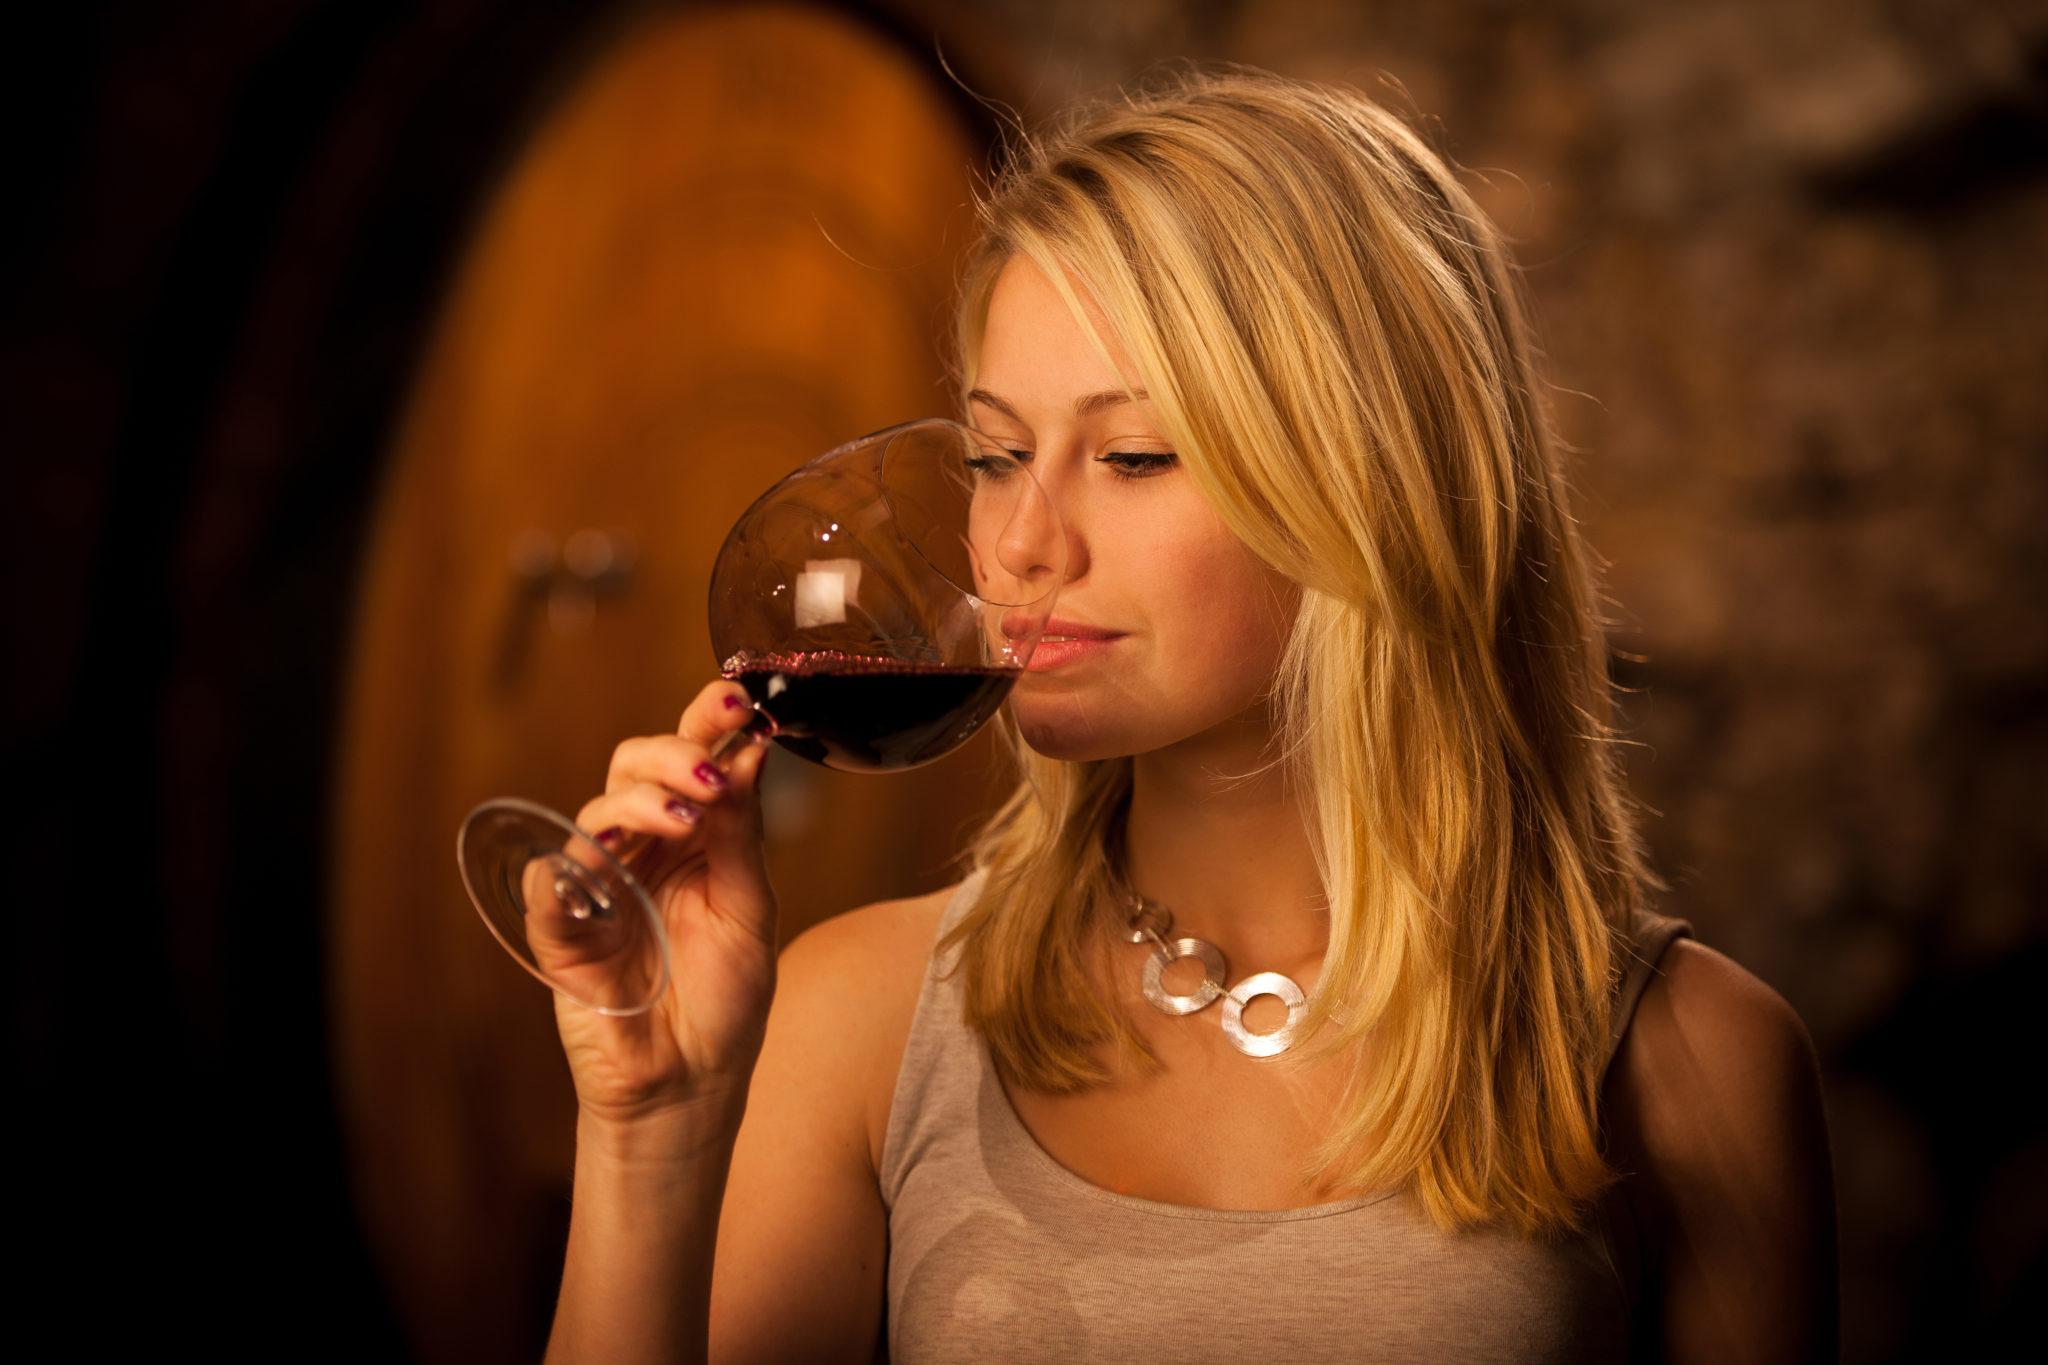 Montepulciano: of each wine is King